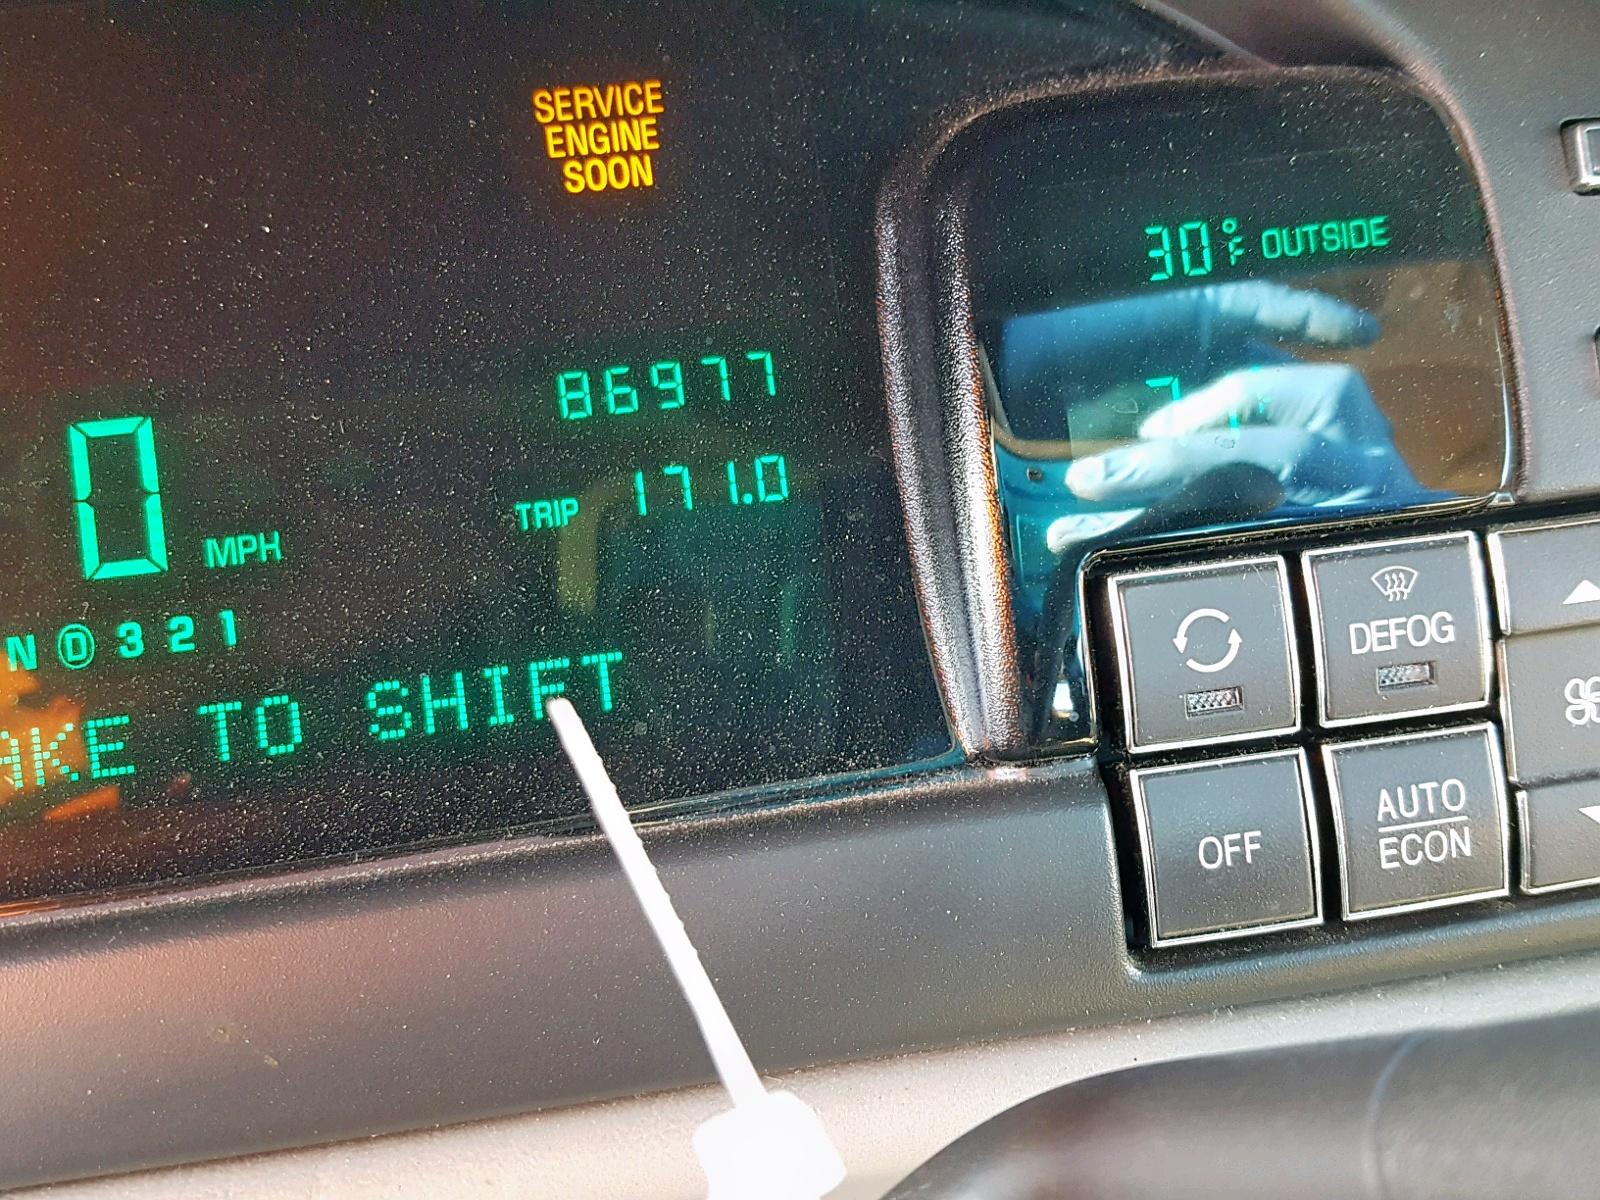 1g6kd54y0xu769033 1999 Cadillac Deville 4 6l Front View